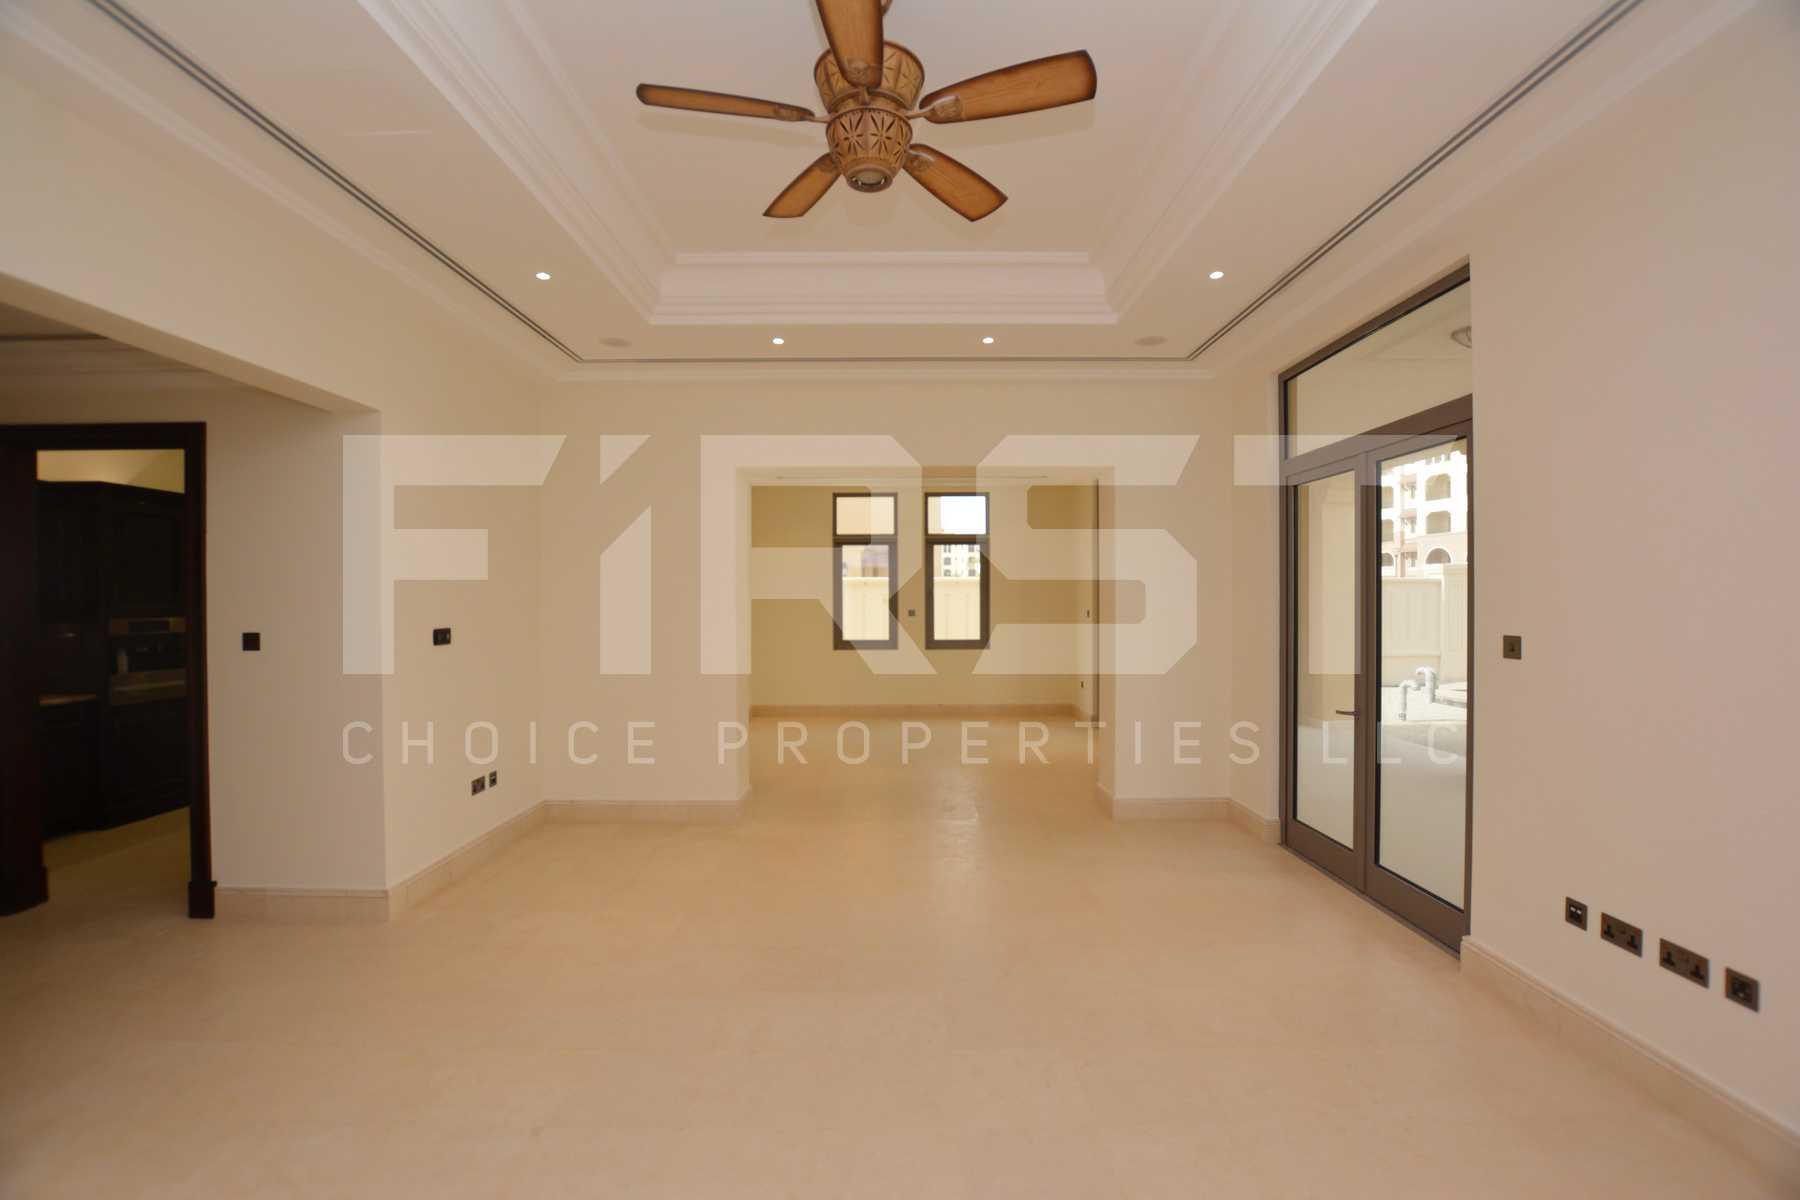 Internal Photo of Delux 5 Bedroom Villa in Saadiyat Beach Villas Saadiyat Island Abu Dhabi UAE (33).jpg